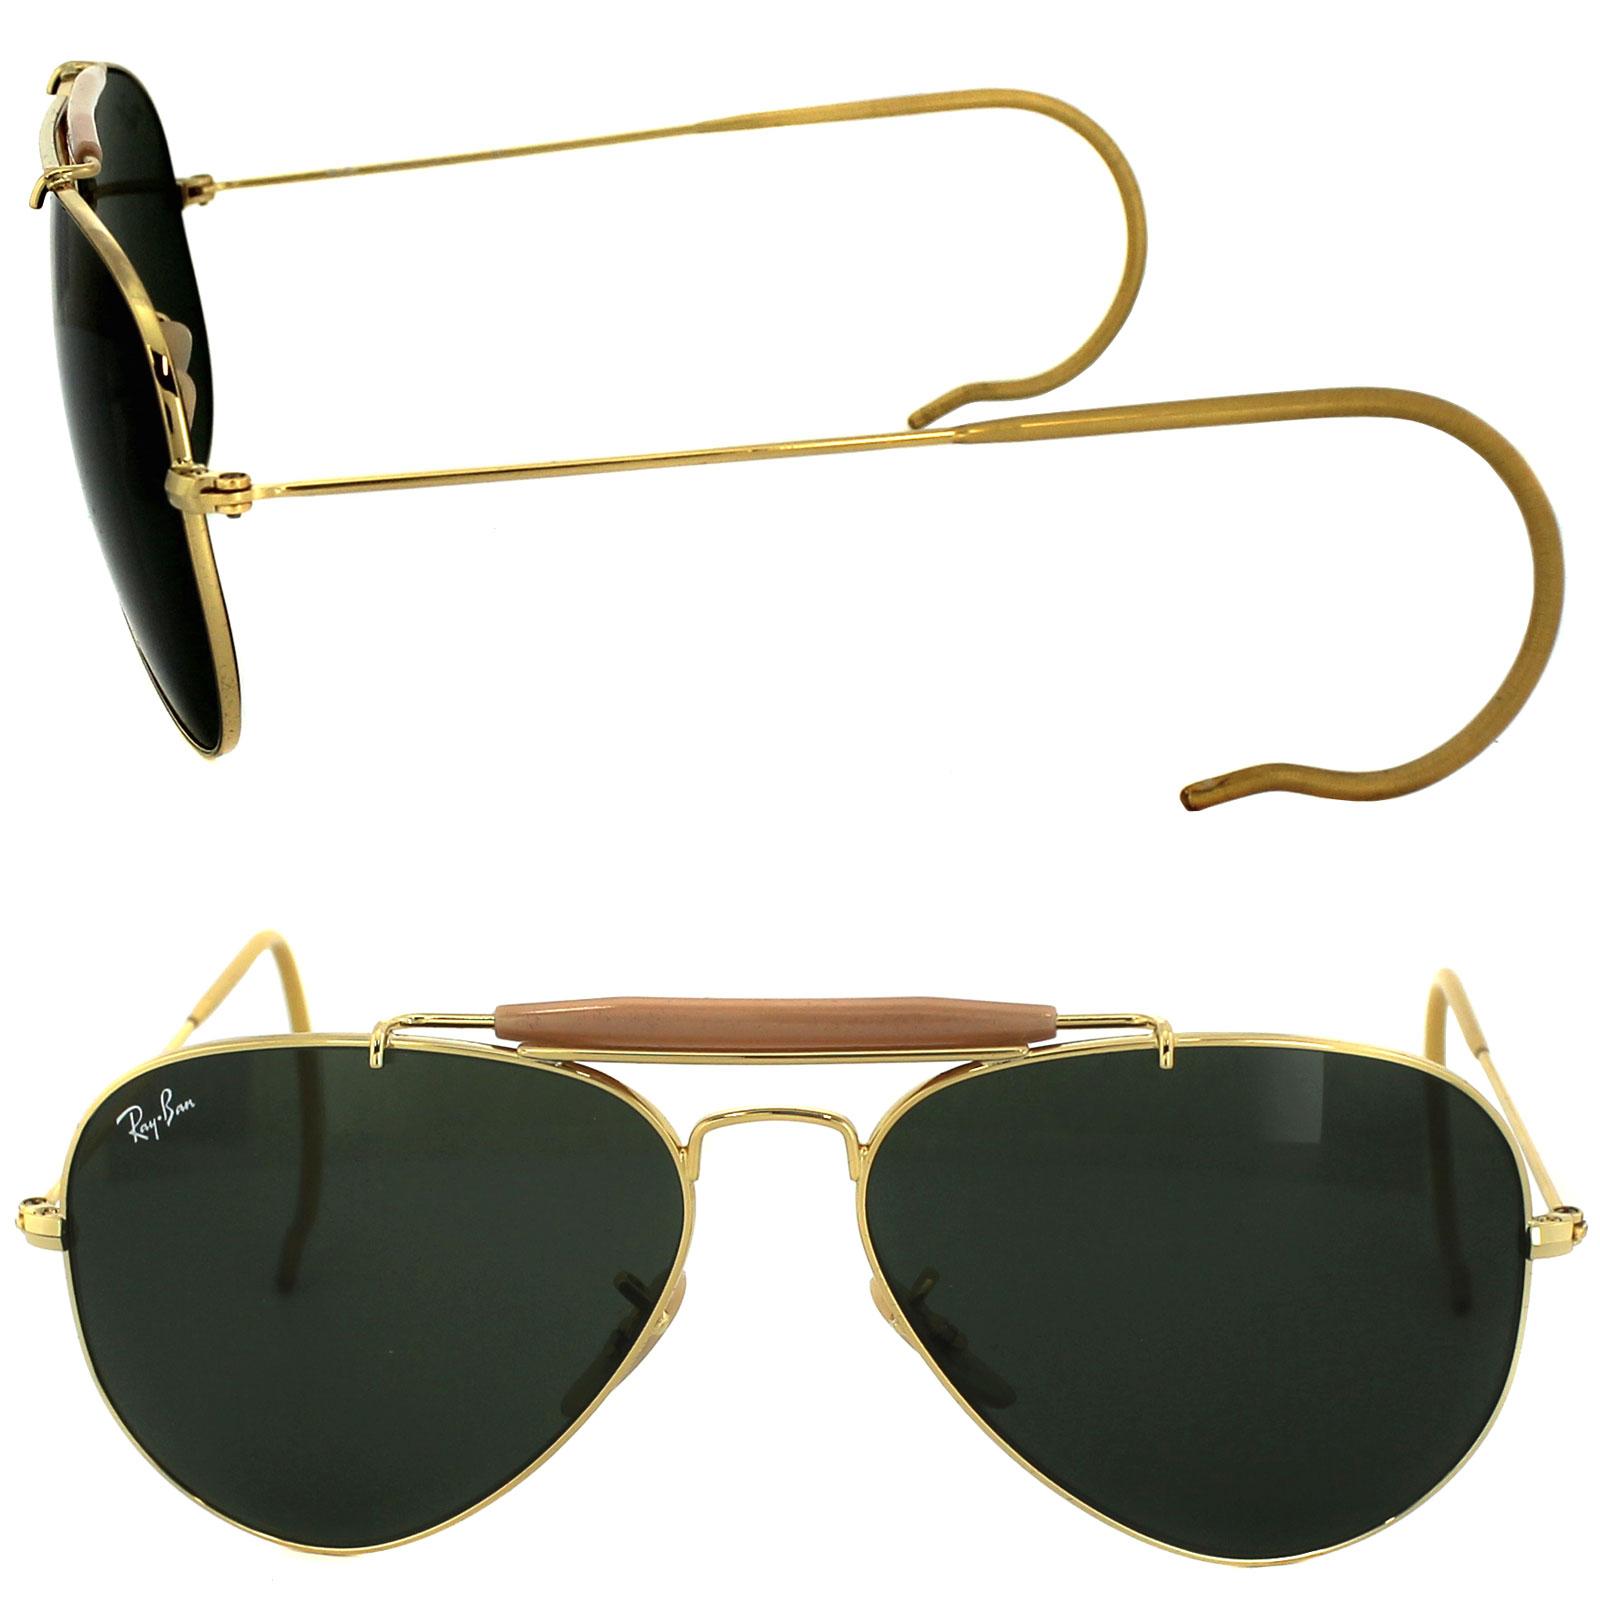 60c7f7837e Ray Ban Aviator Outdoorsman Sunglasses Rb3030 L0216 « One More Soul